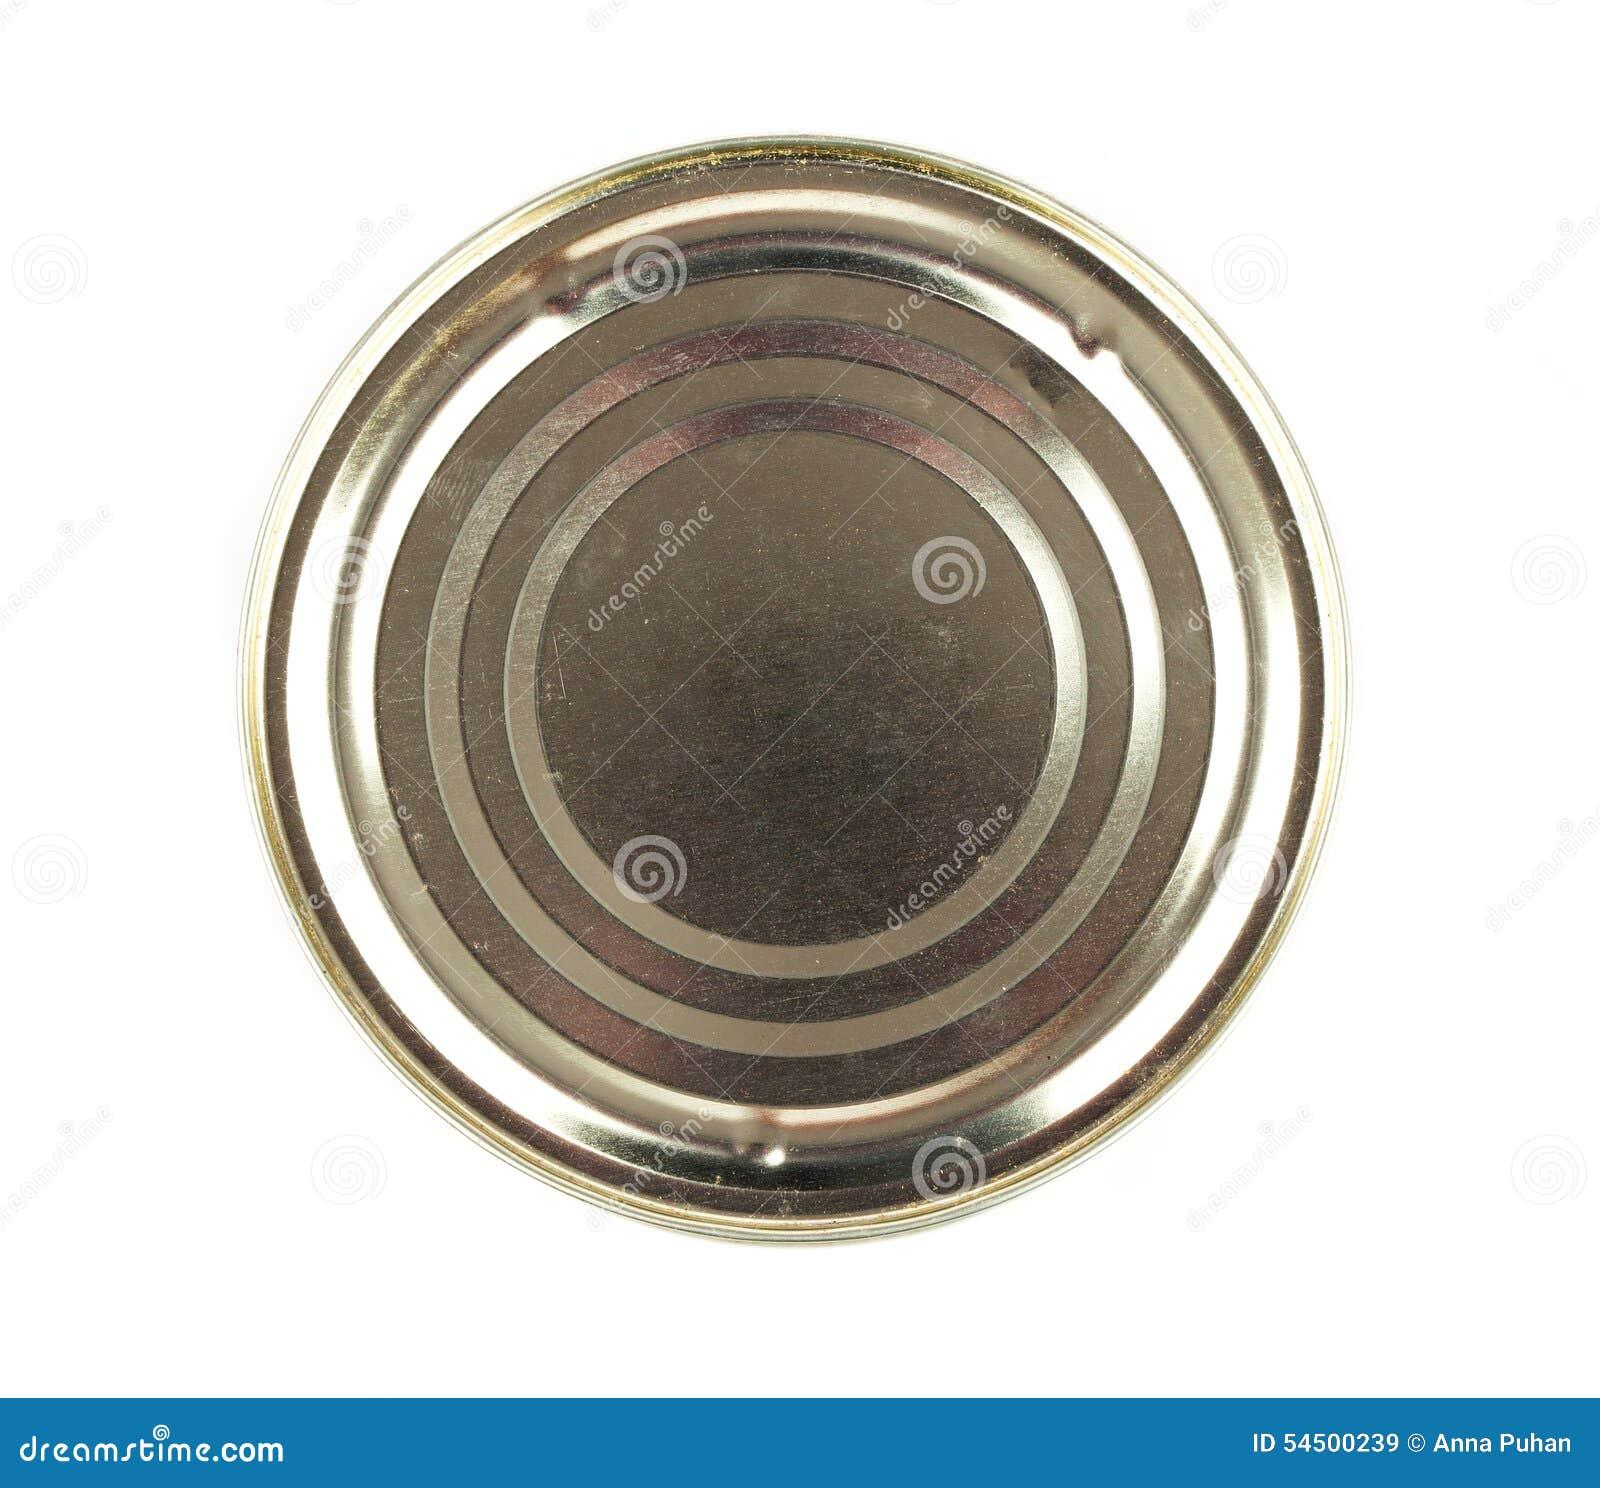 Deksel of Basis van Voedsel Tin Can